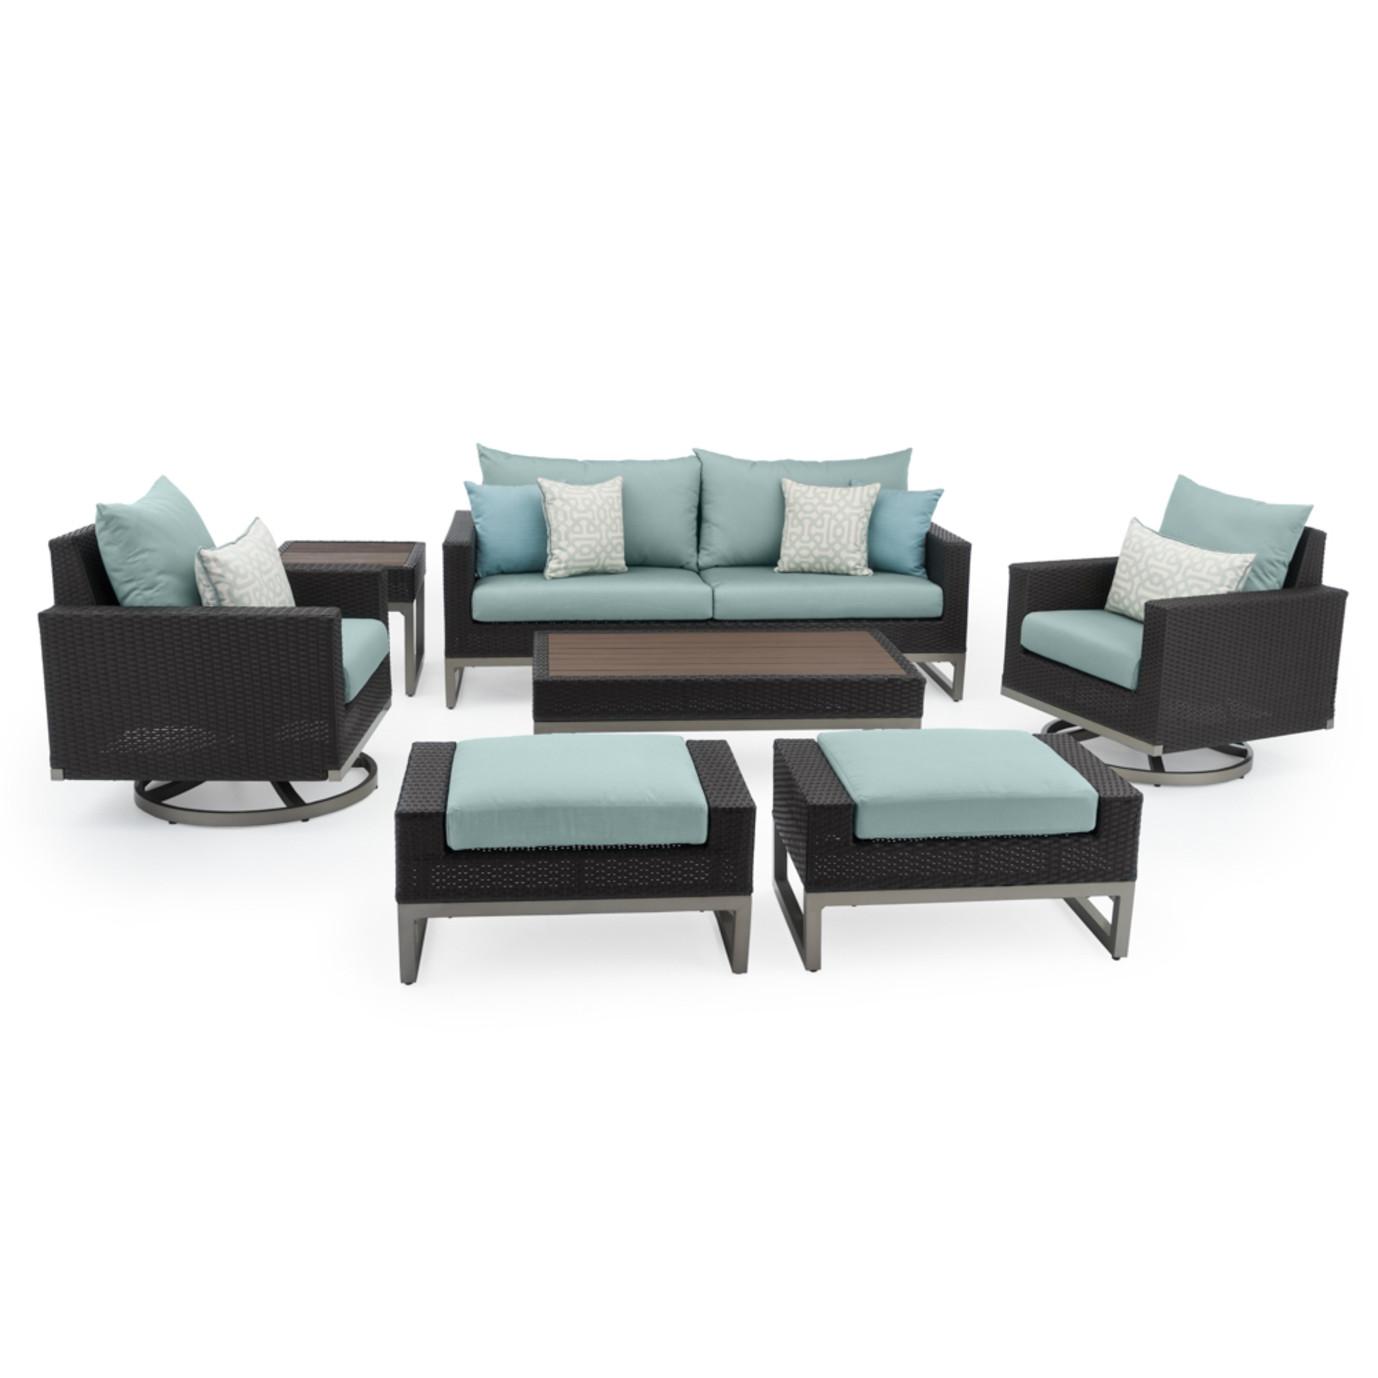 Milo™ Espresso 7pc Motion Deep Seating Set - Spa Blue